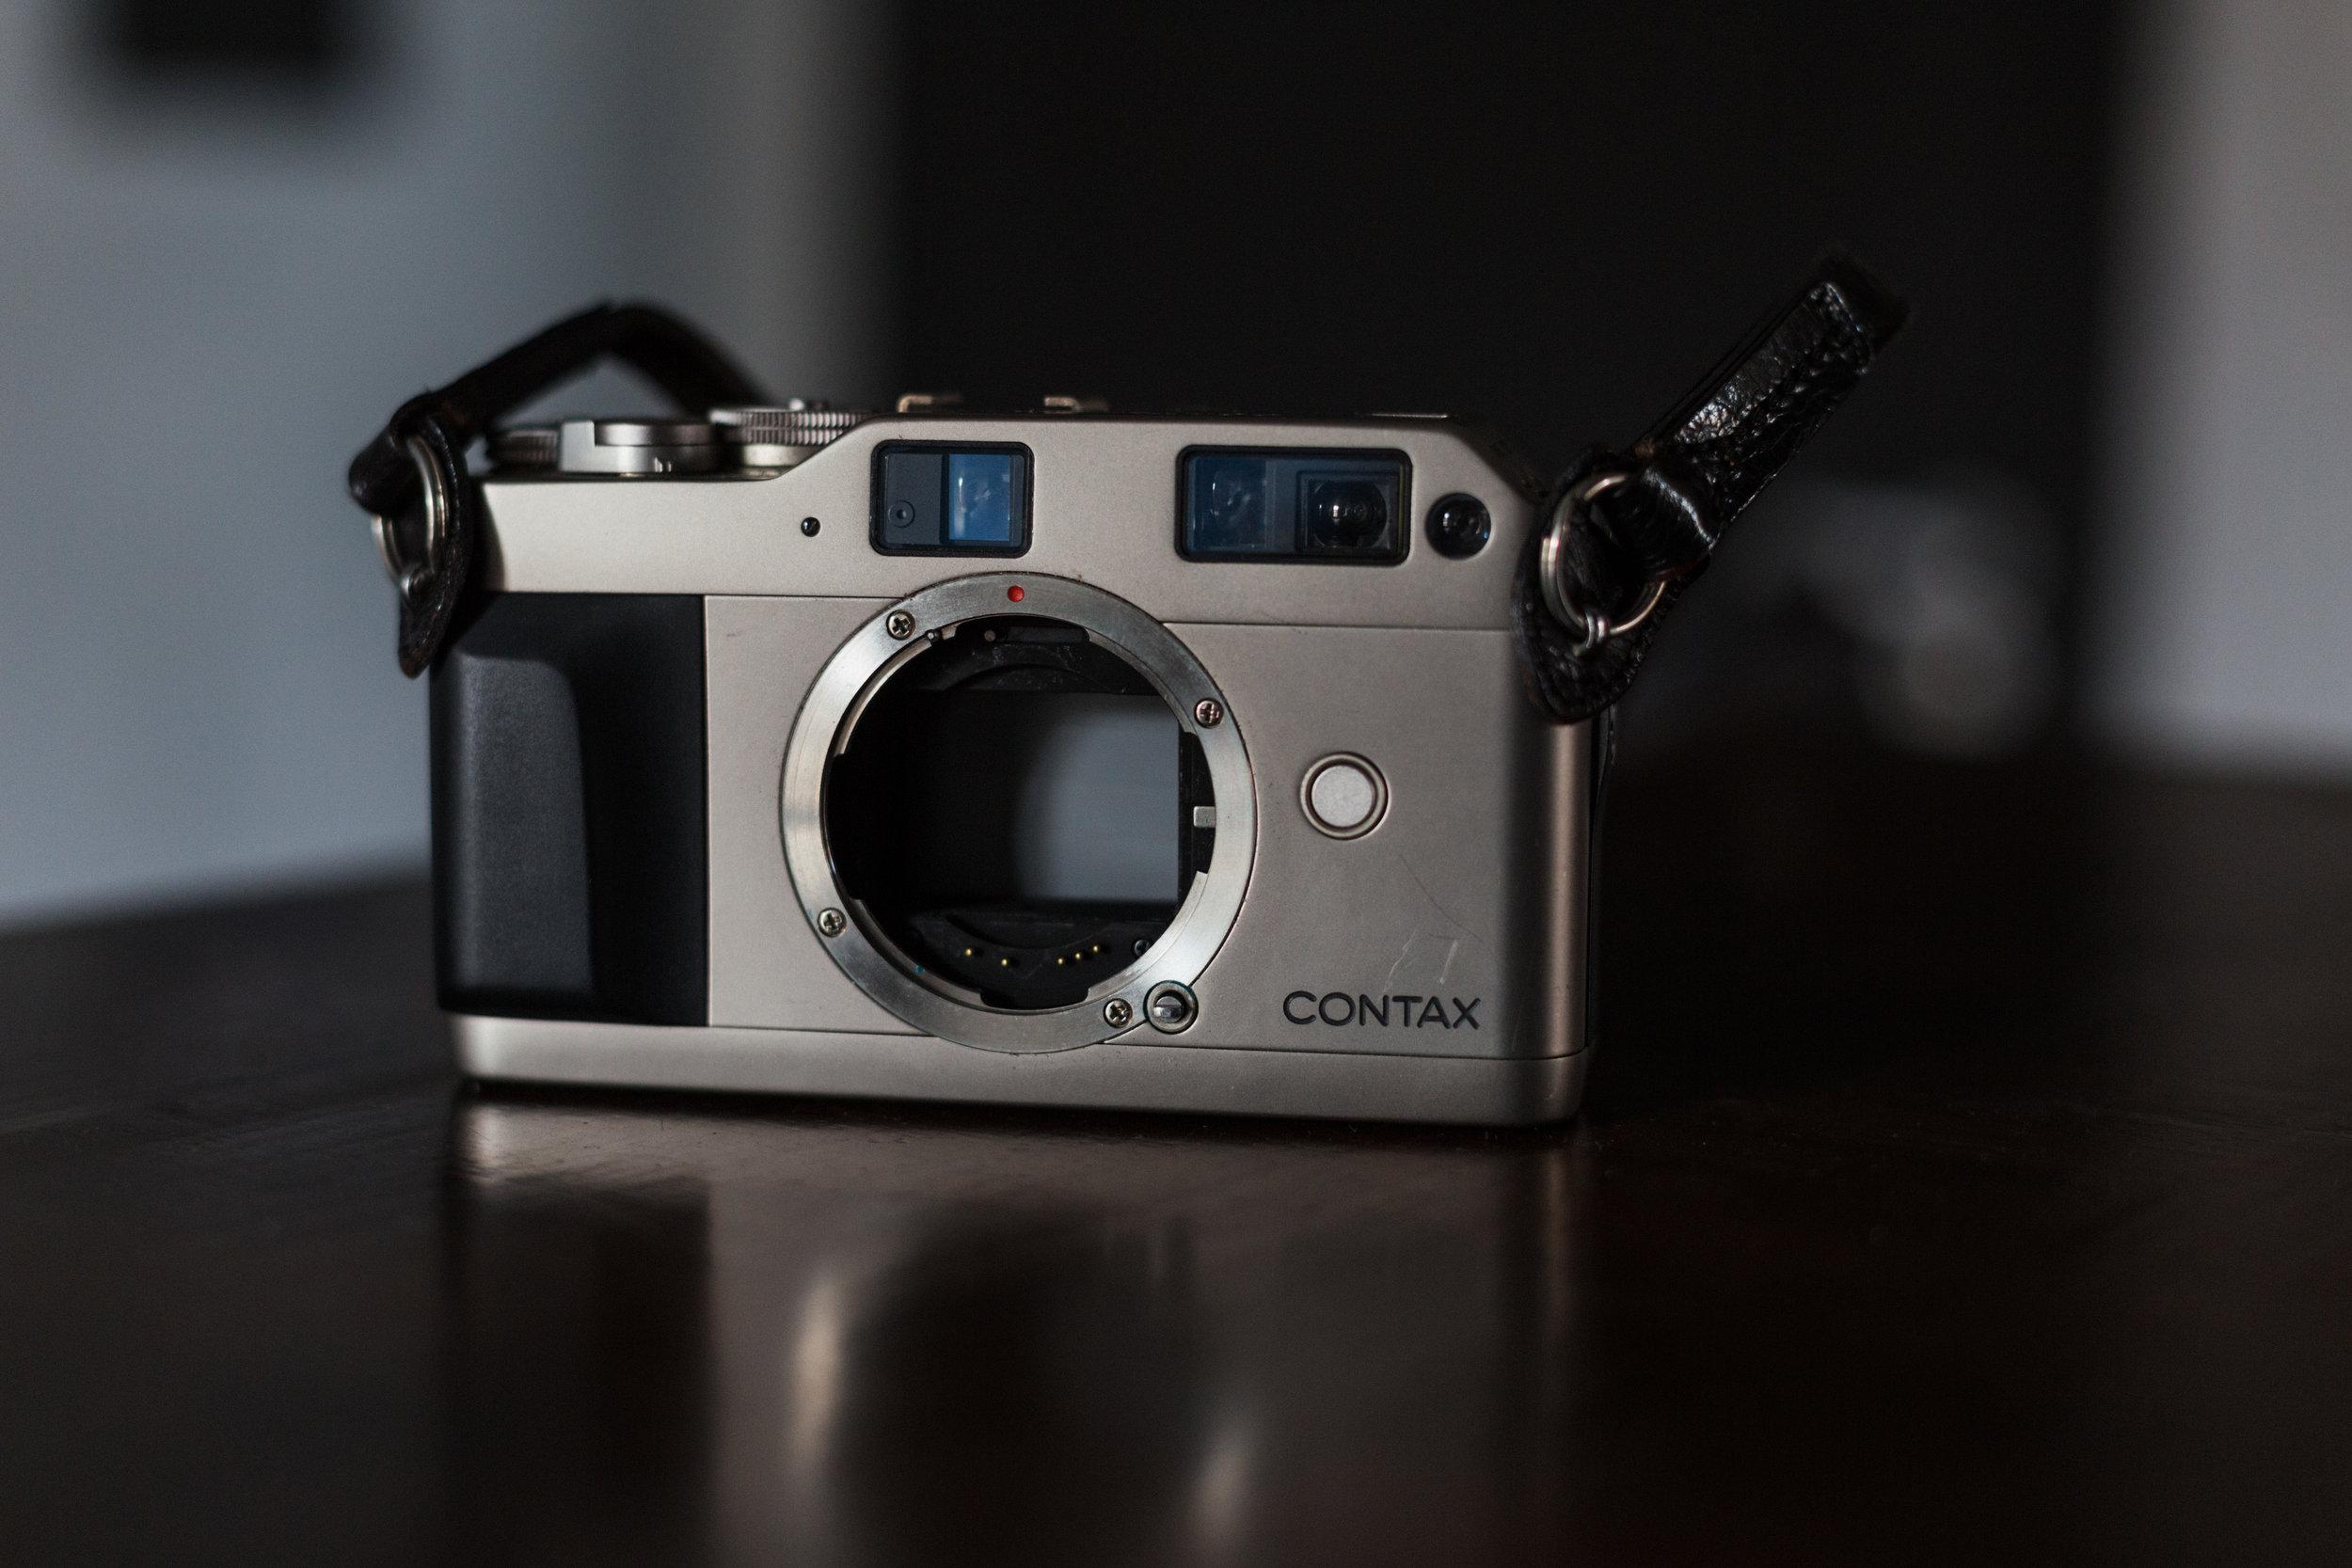 contax g1 mirrorless camera